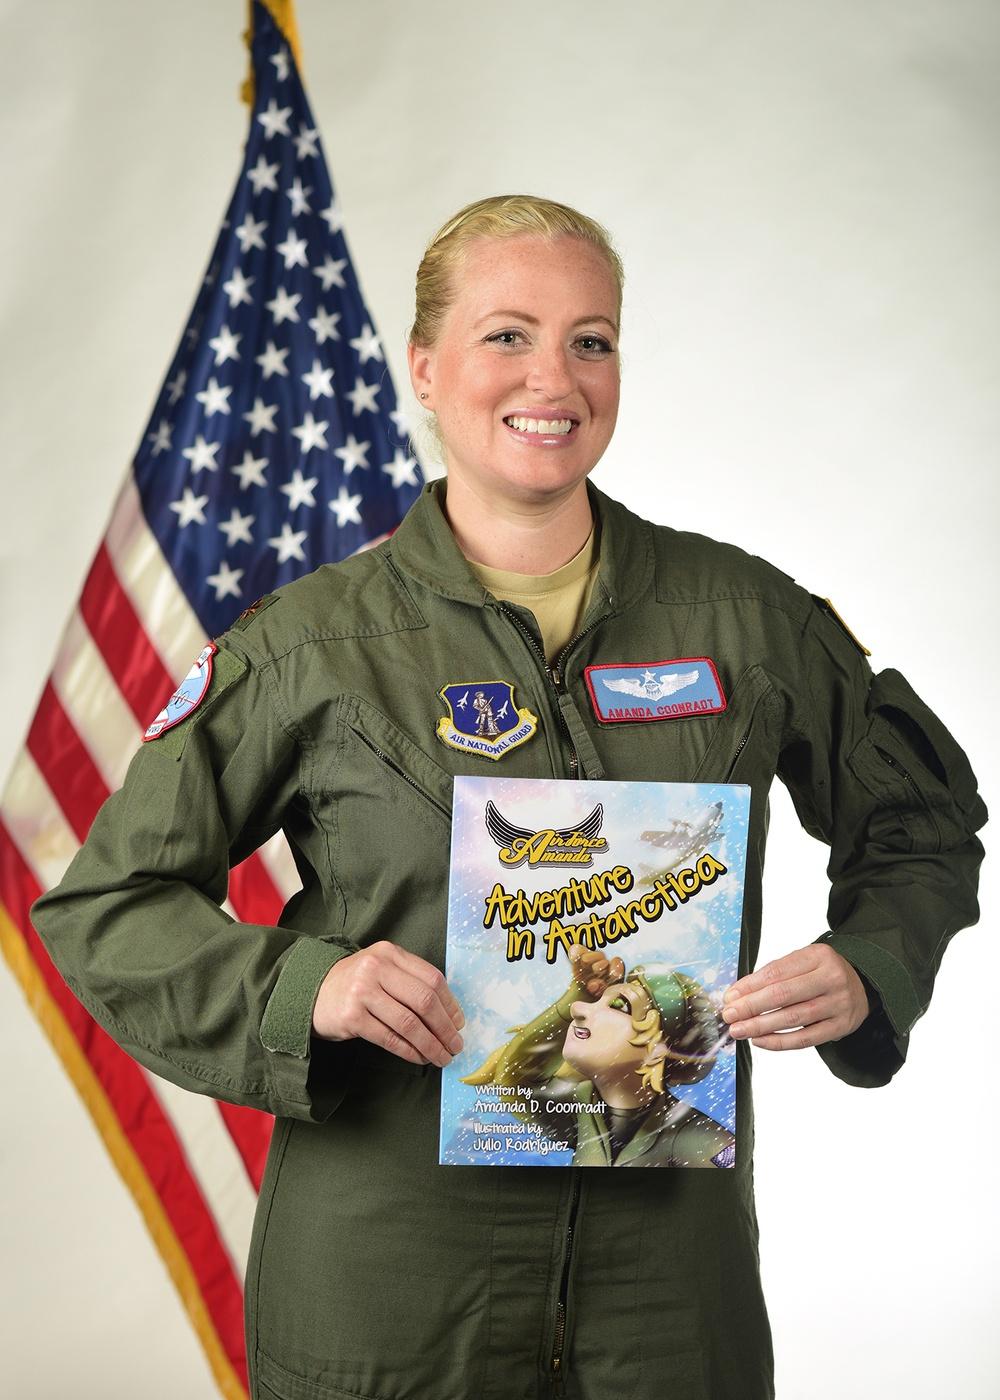 LC-130 navigator shares her experiences in Antarctica through children's book